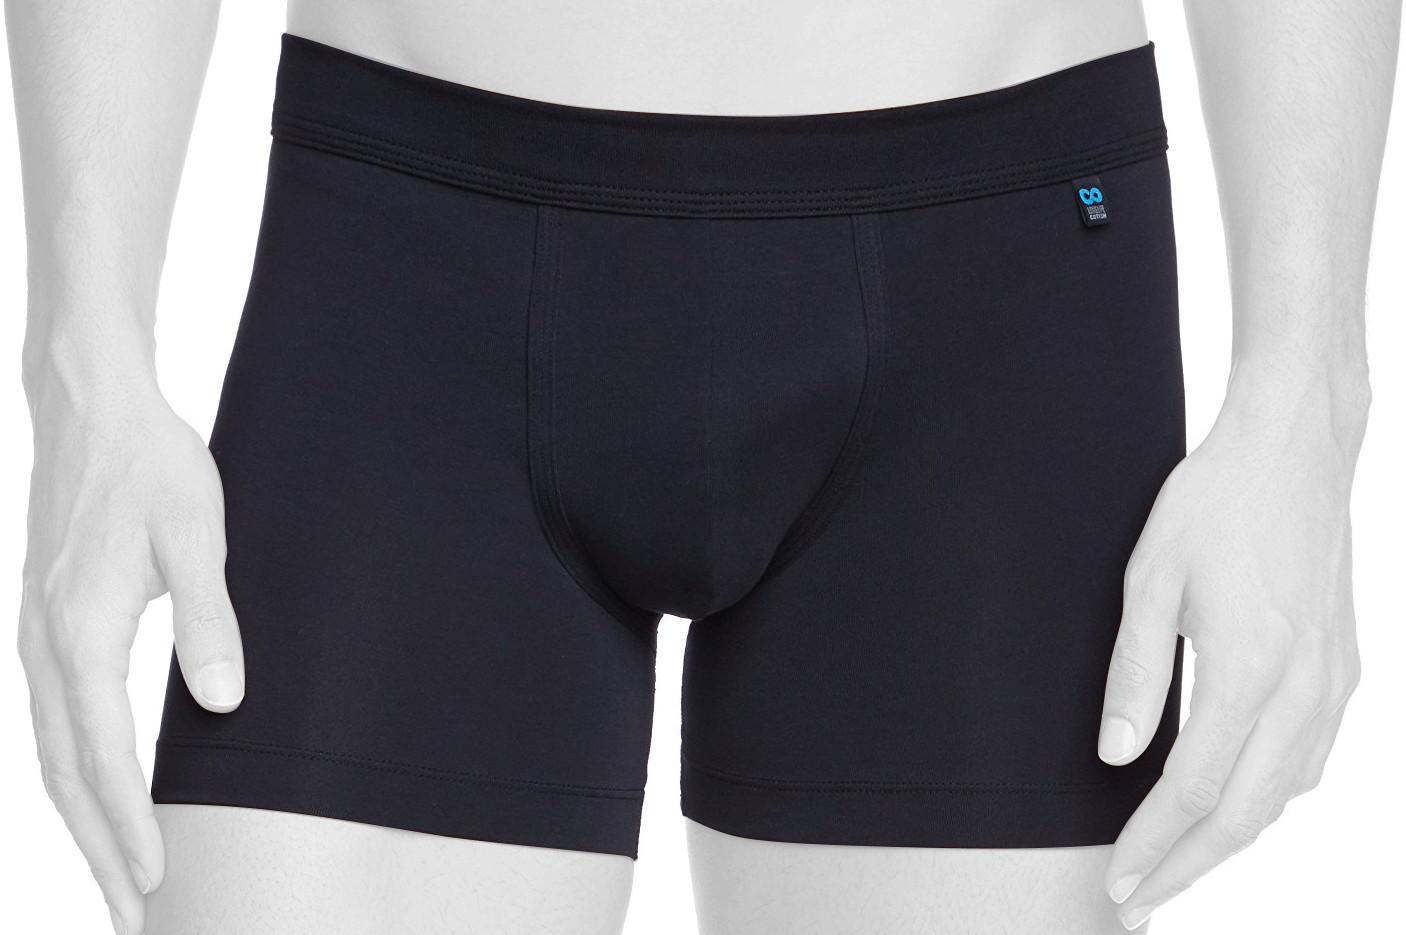 SCHIESSER Herren Shorts Long Life Cotton Boxershorts